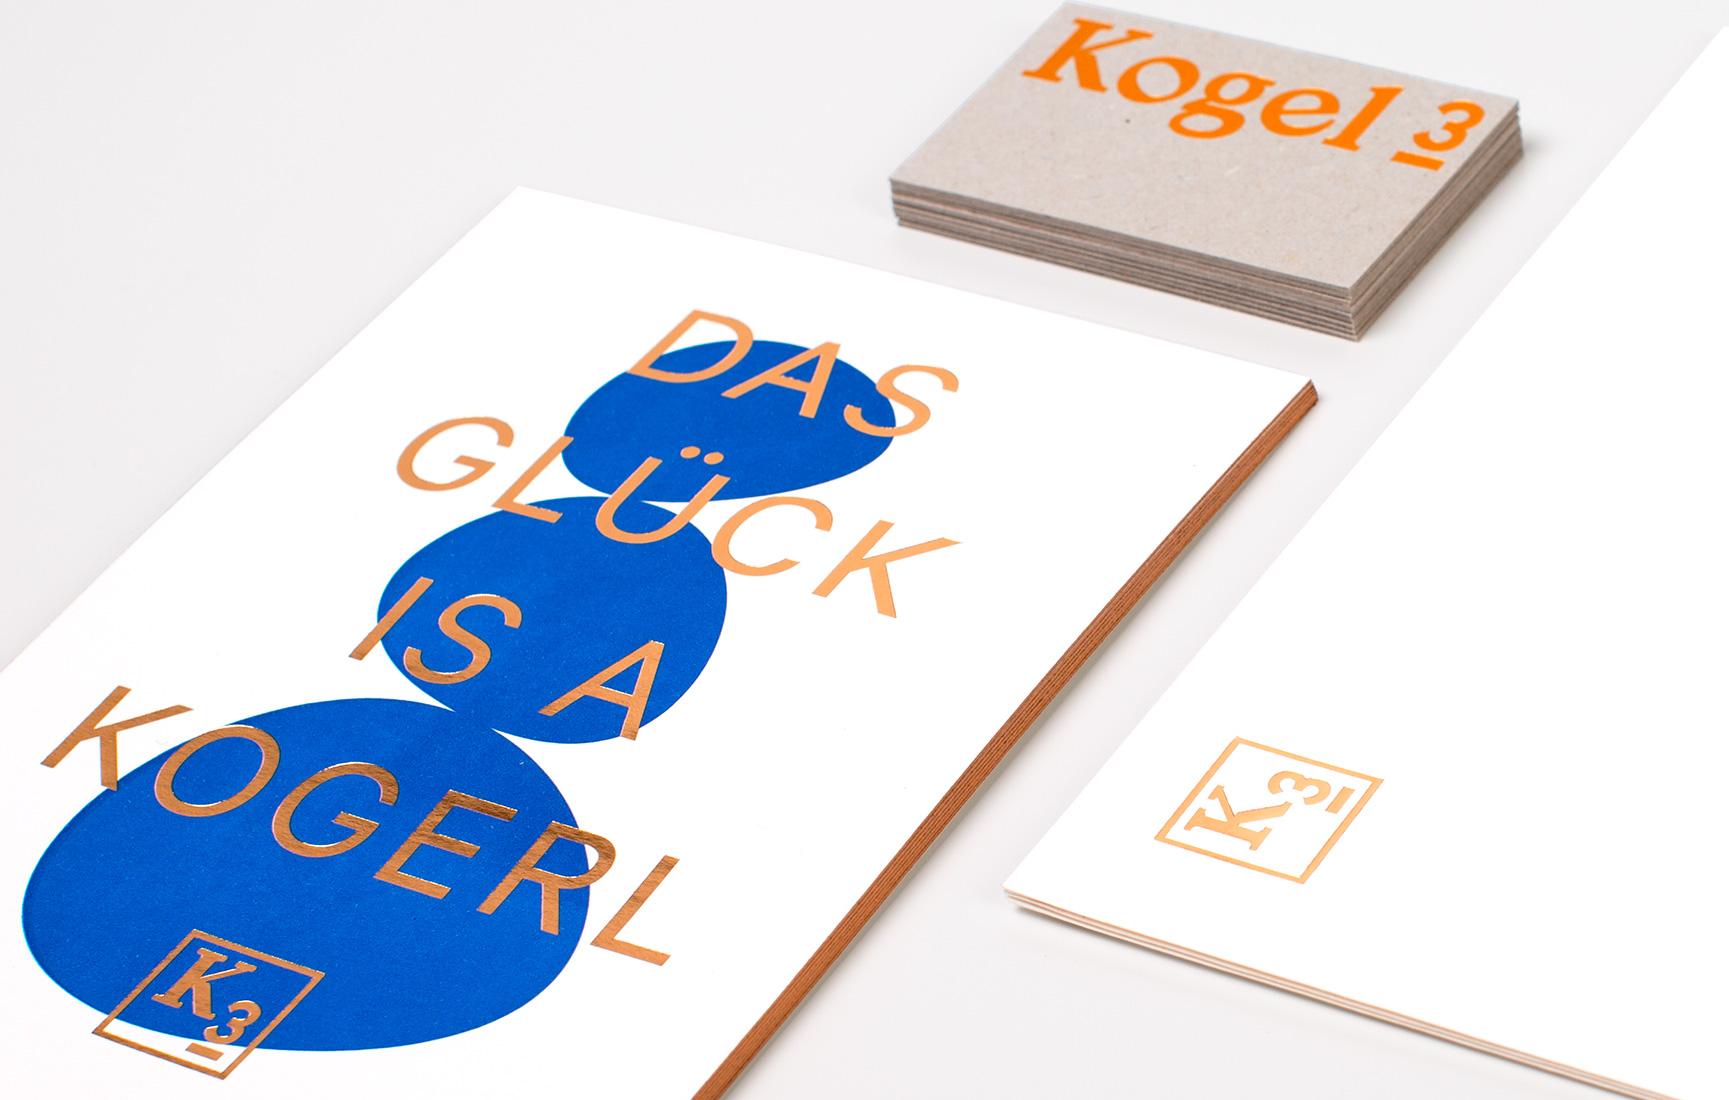 Kogel3-work_22